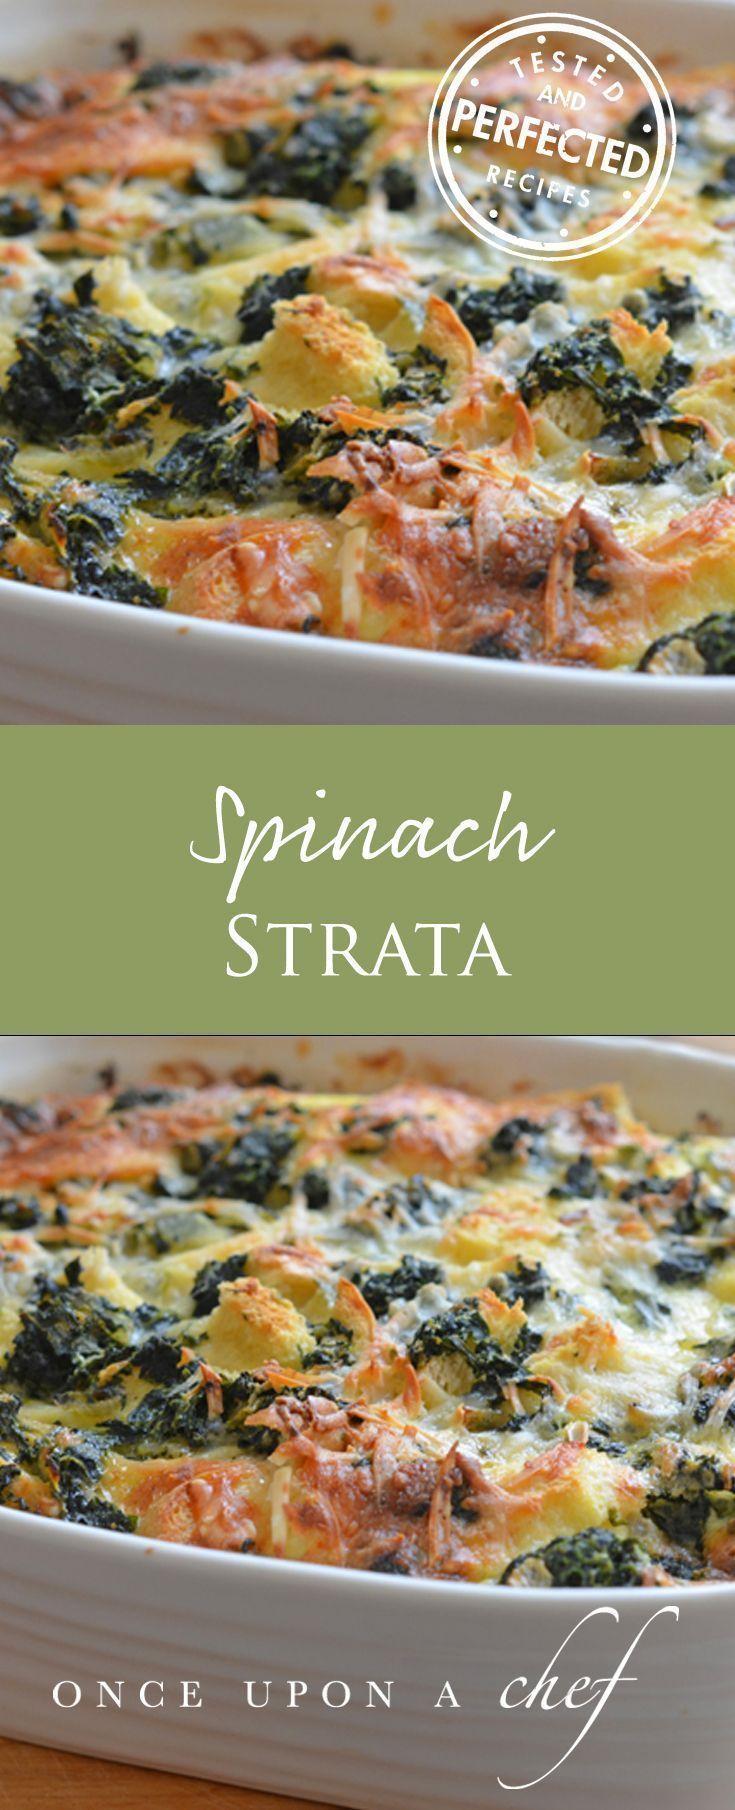 Spinach & Cheese Strata #spinach #cheese